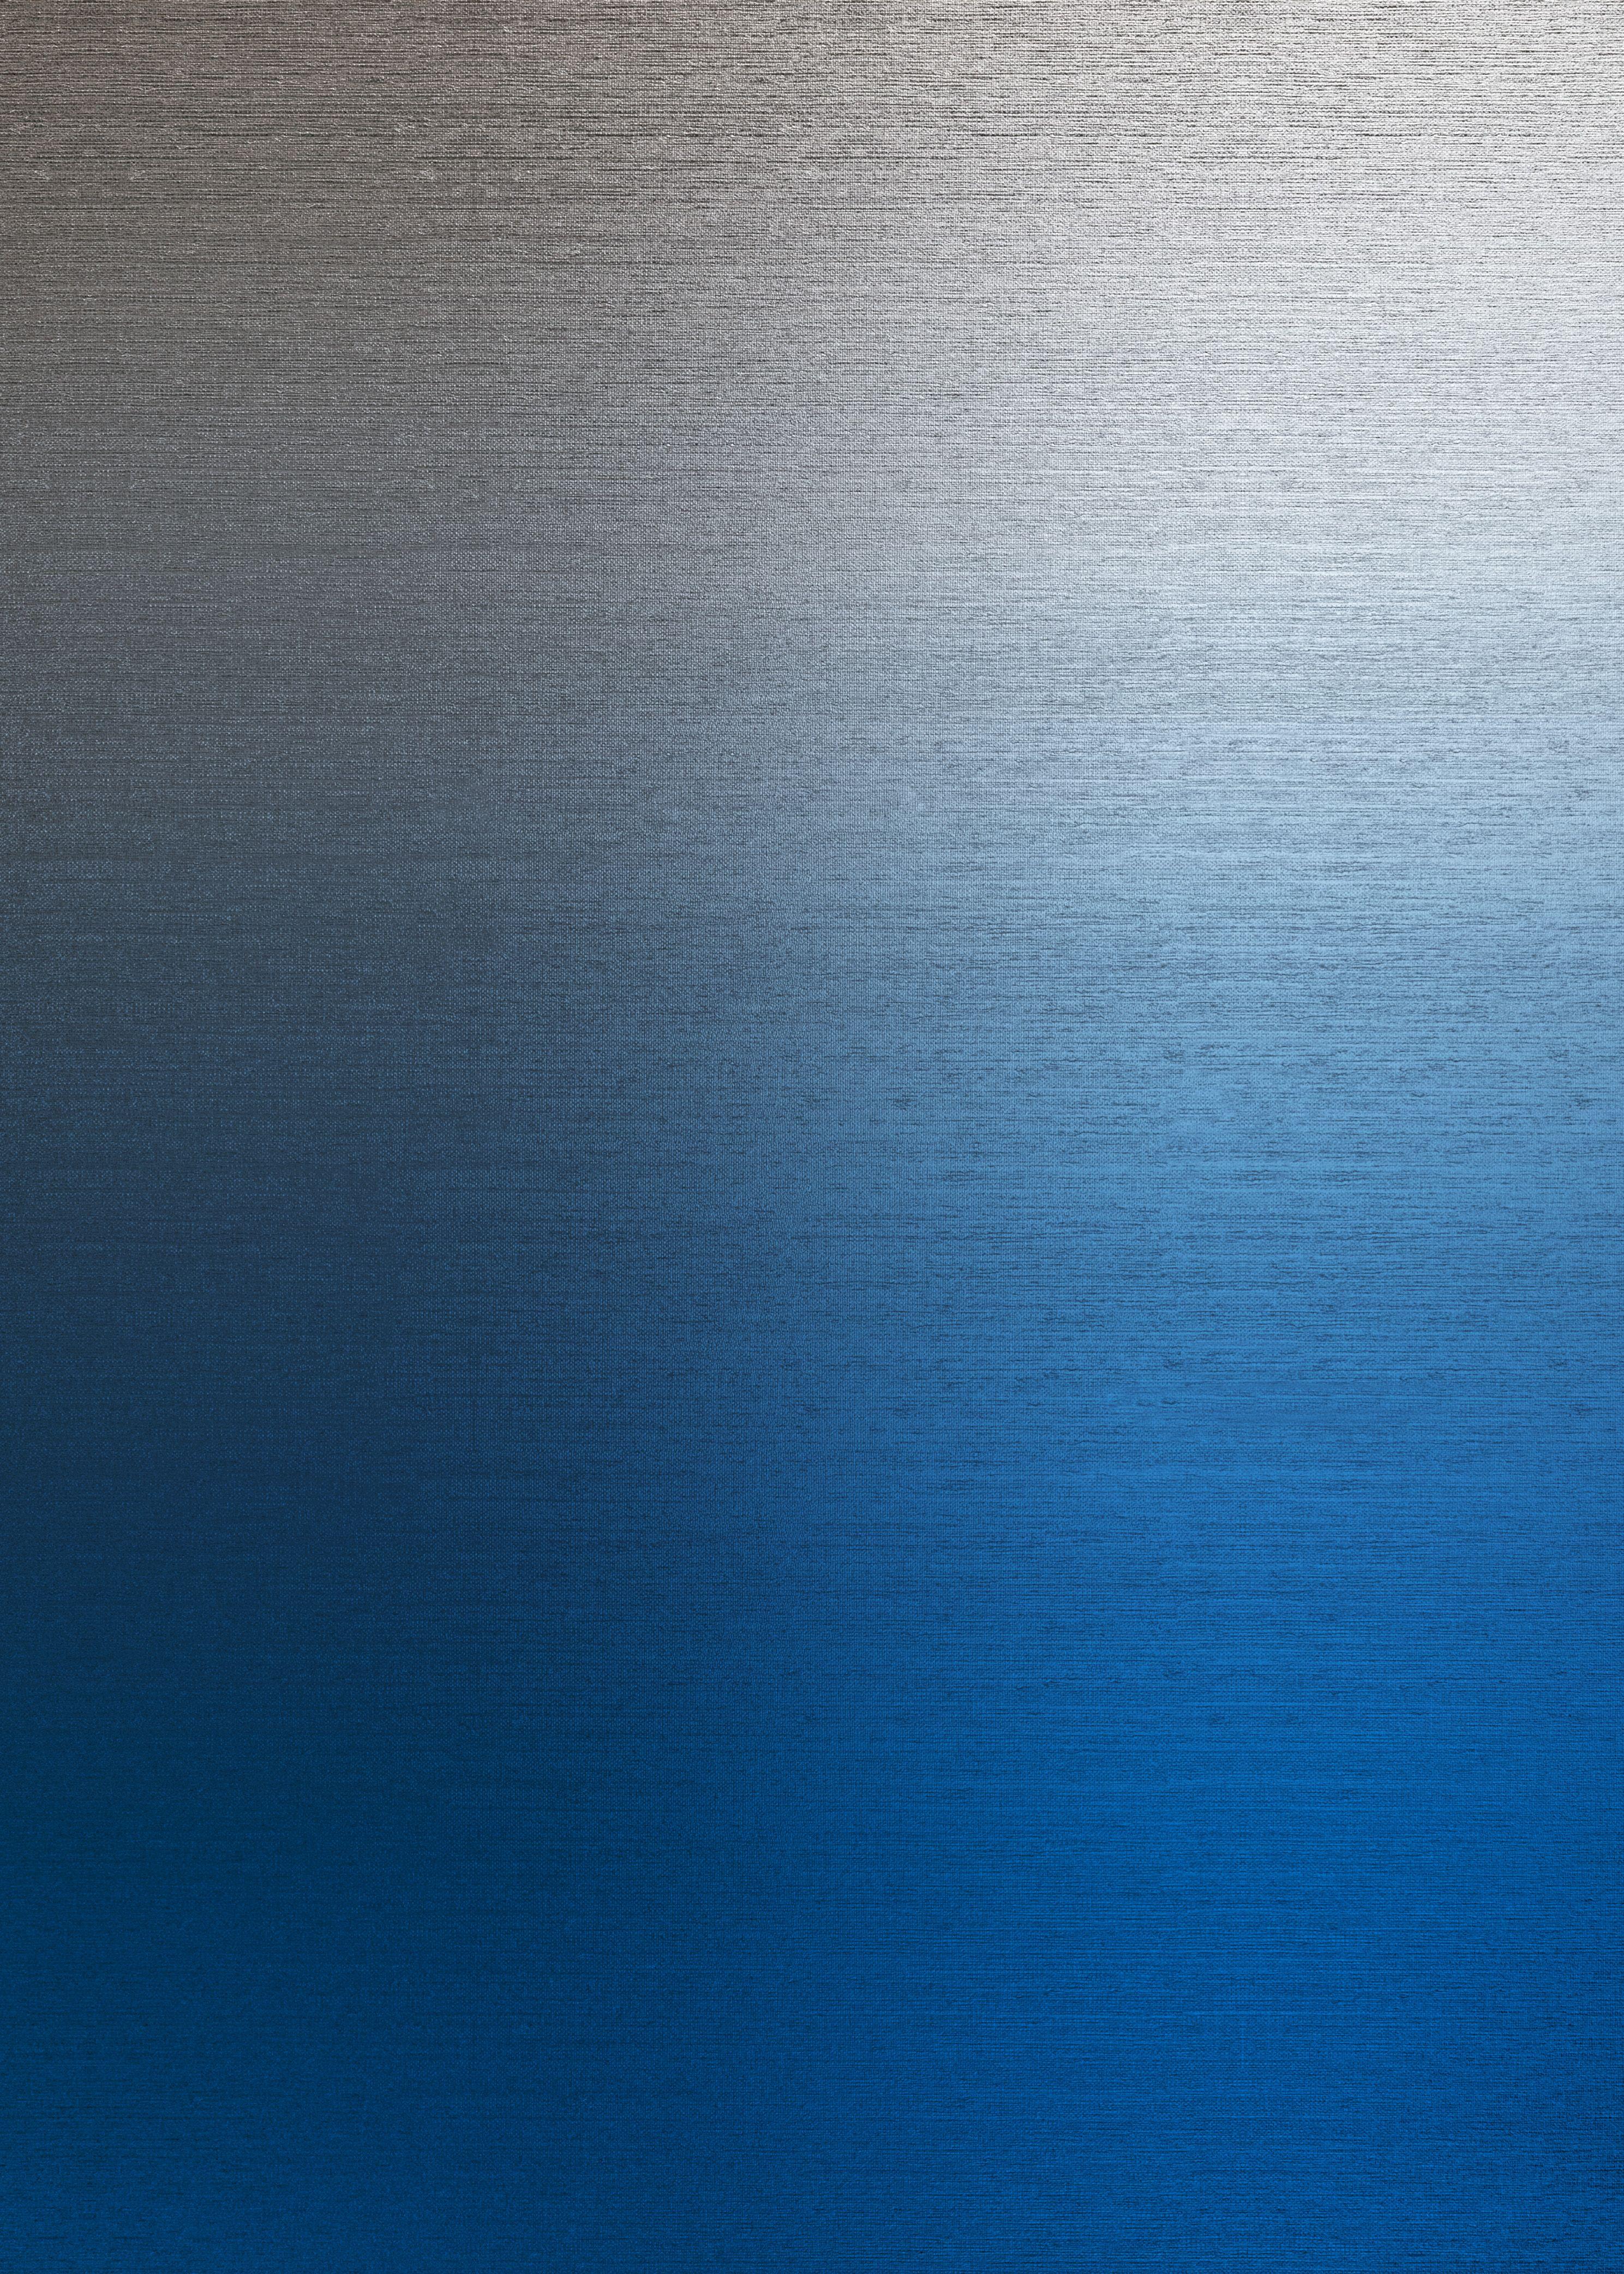 Calico Wallpaper Brasscloth 'Cobalt' Wallpaper, Wall